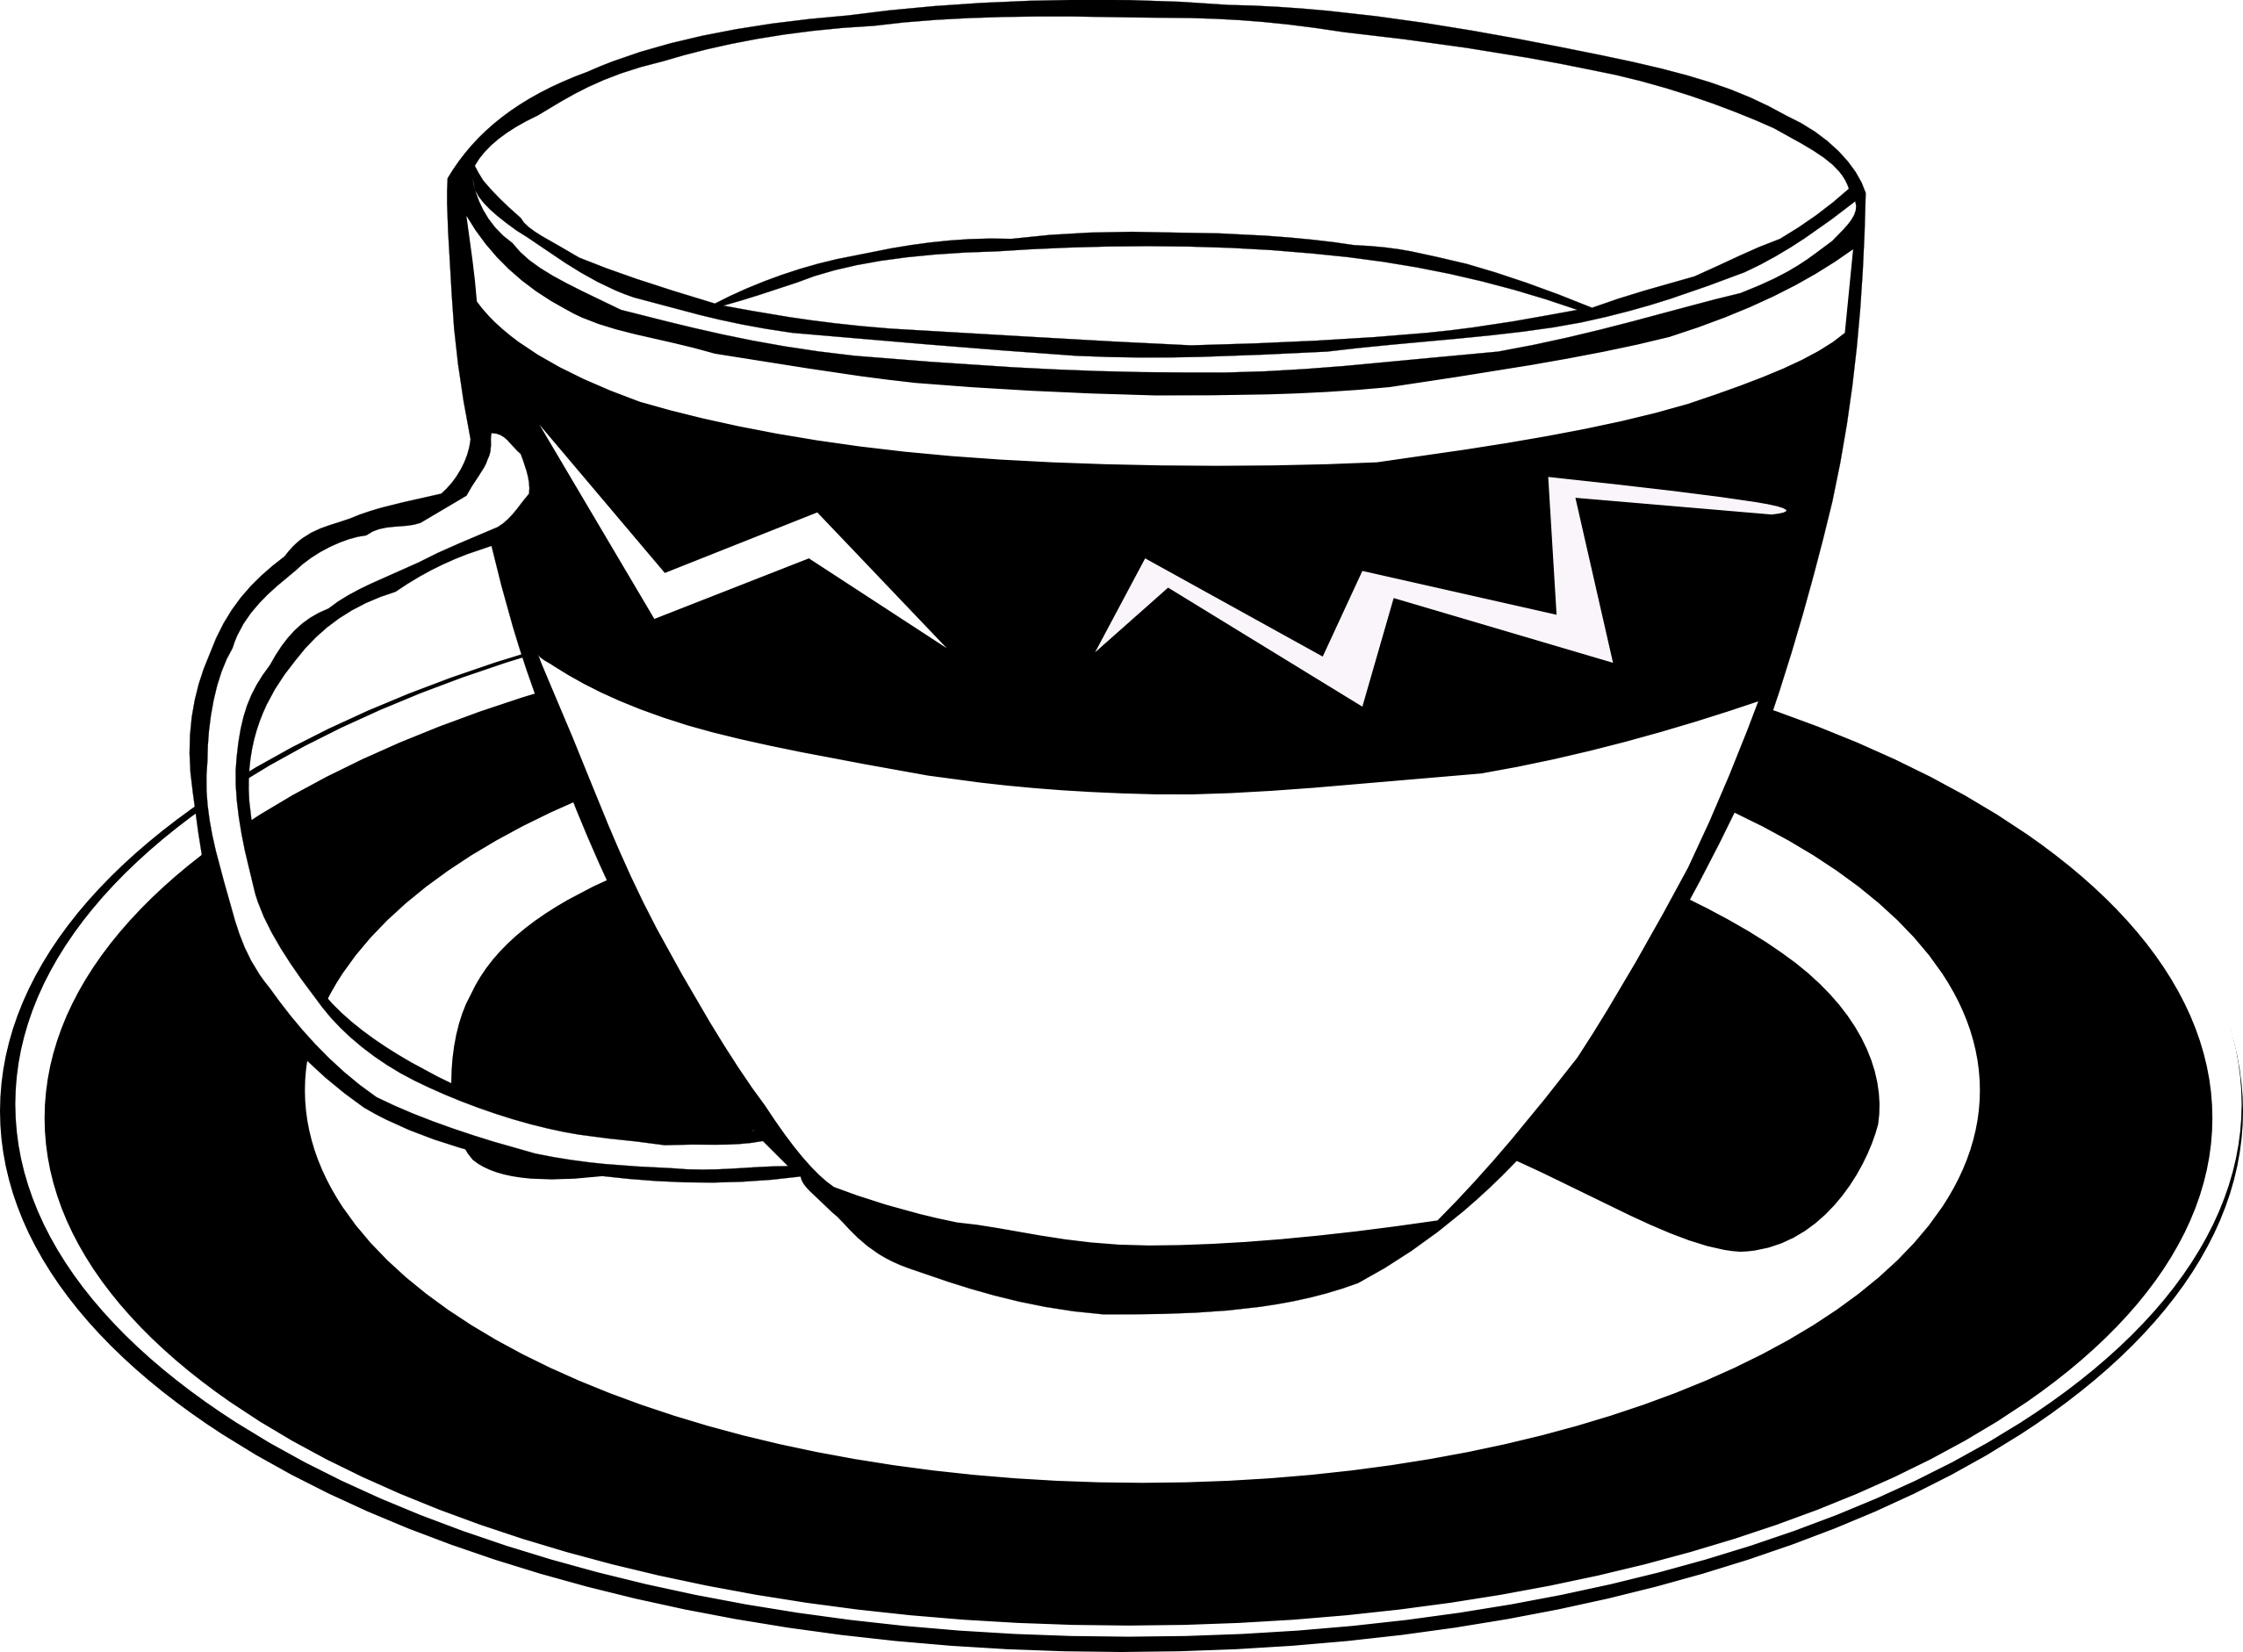 image library Ff menu black white. Teacup clipart free